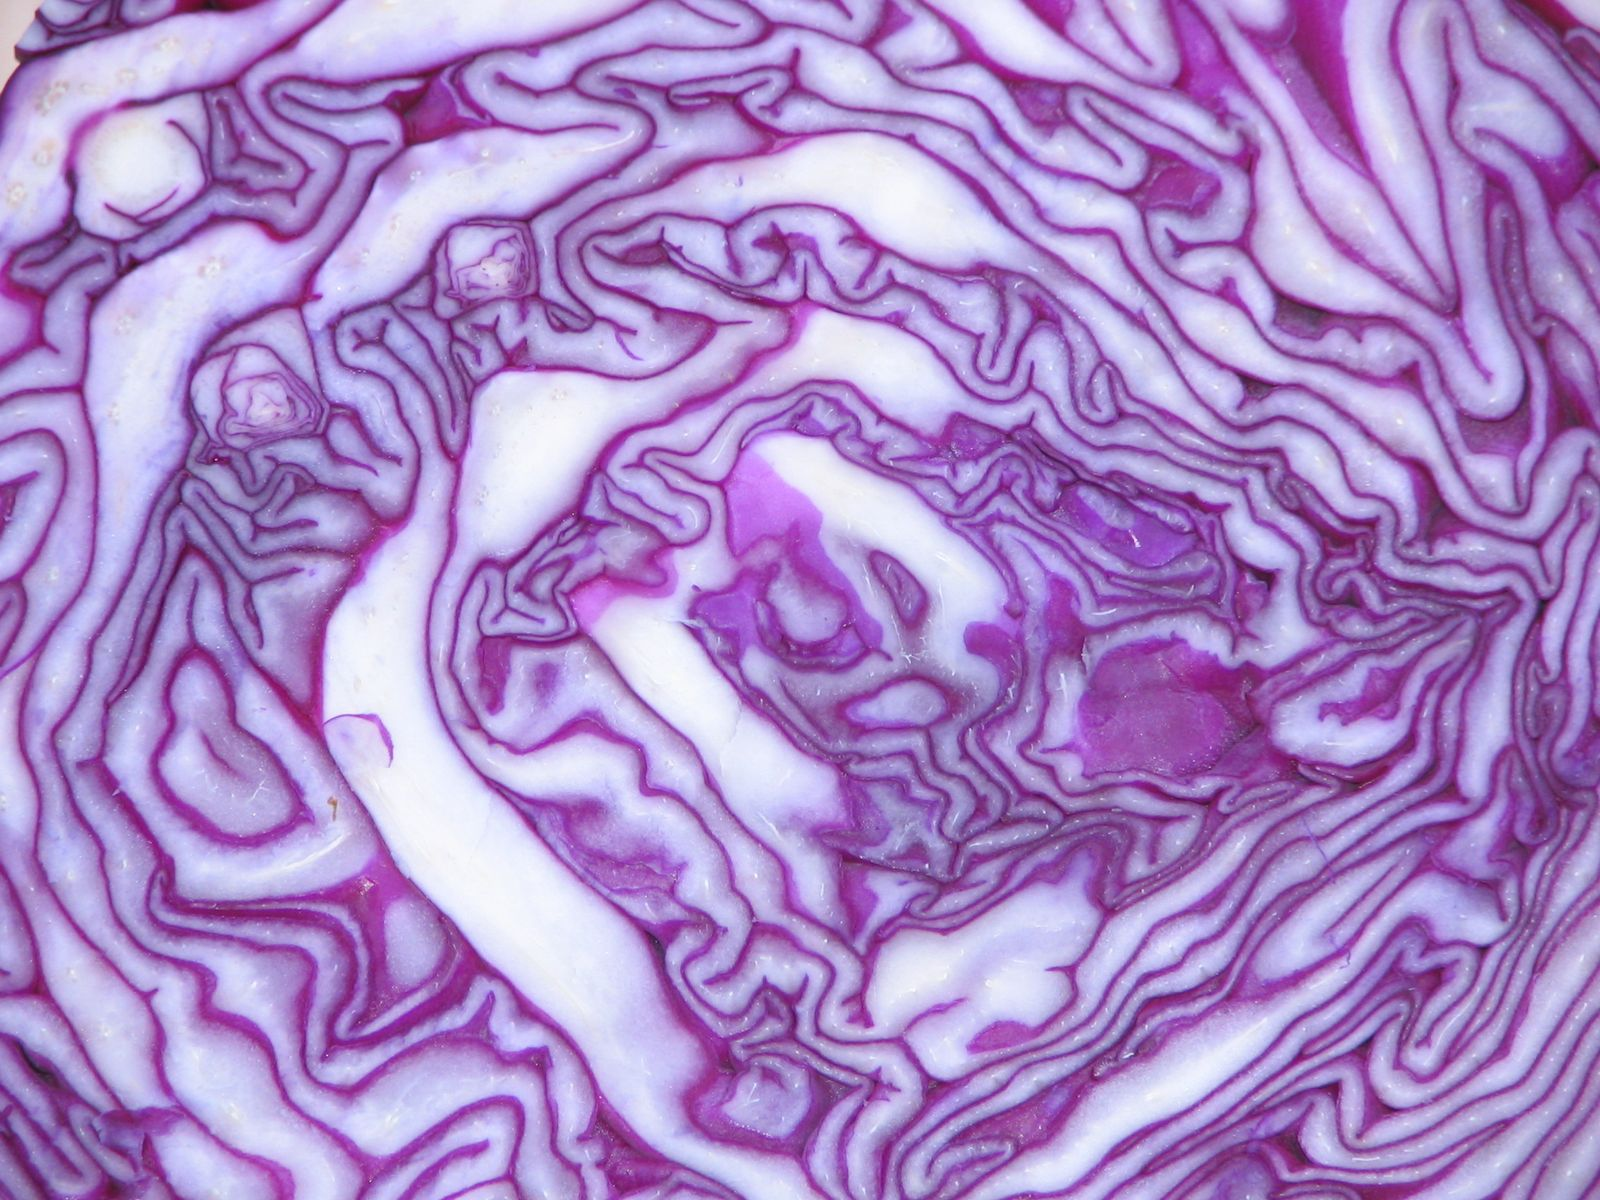 Red Cabbage4.jpg